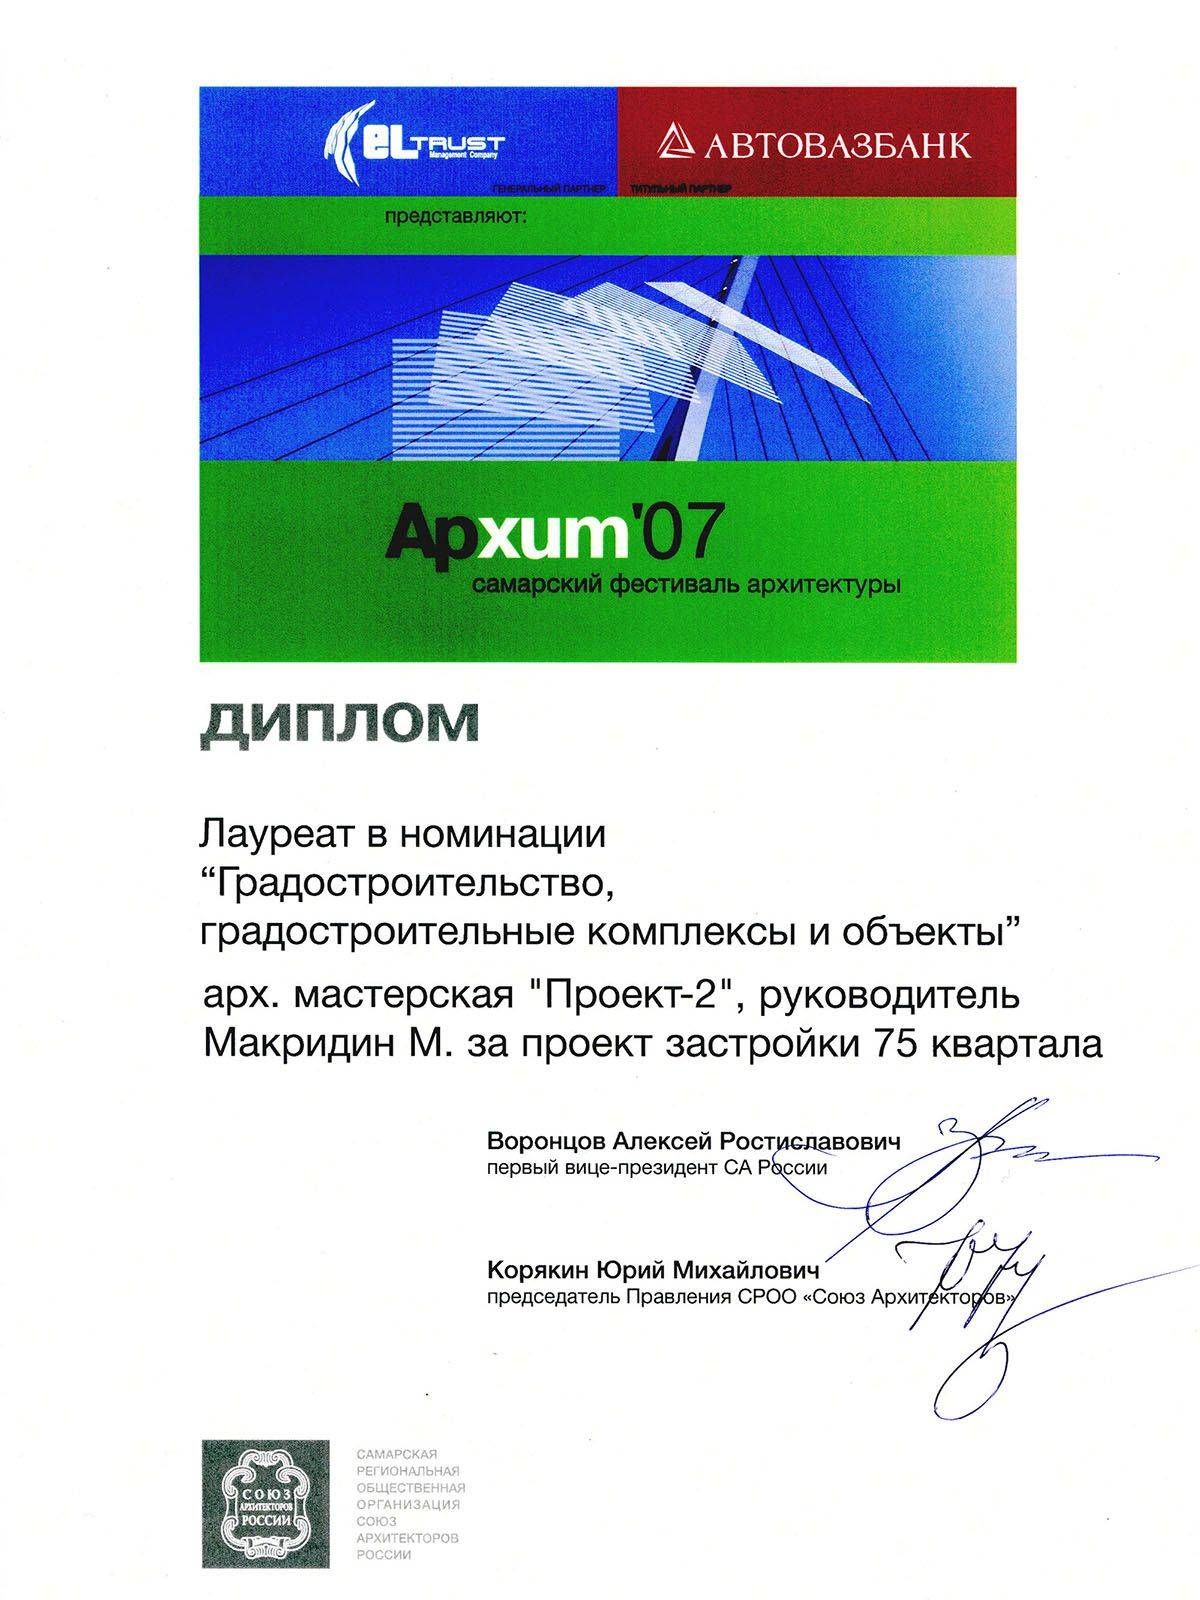 Самарский фестиваль архитектуры «Архит'07»